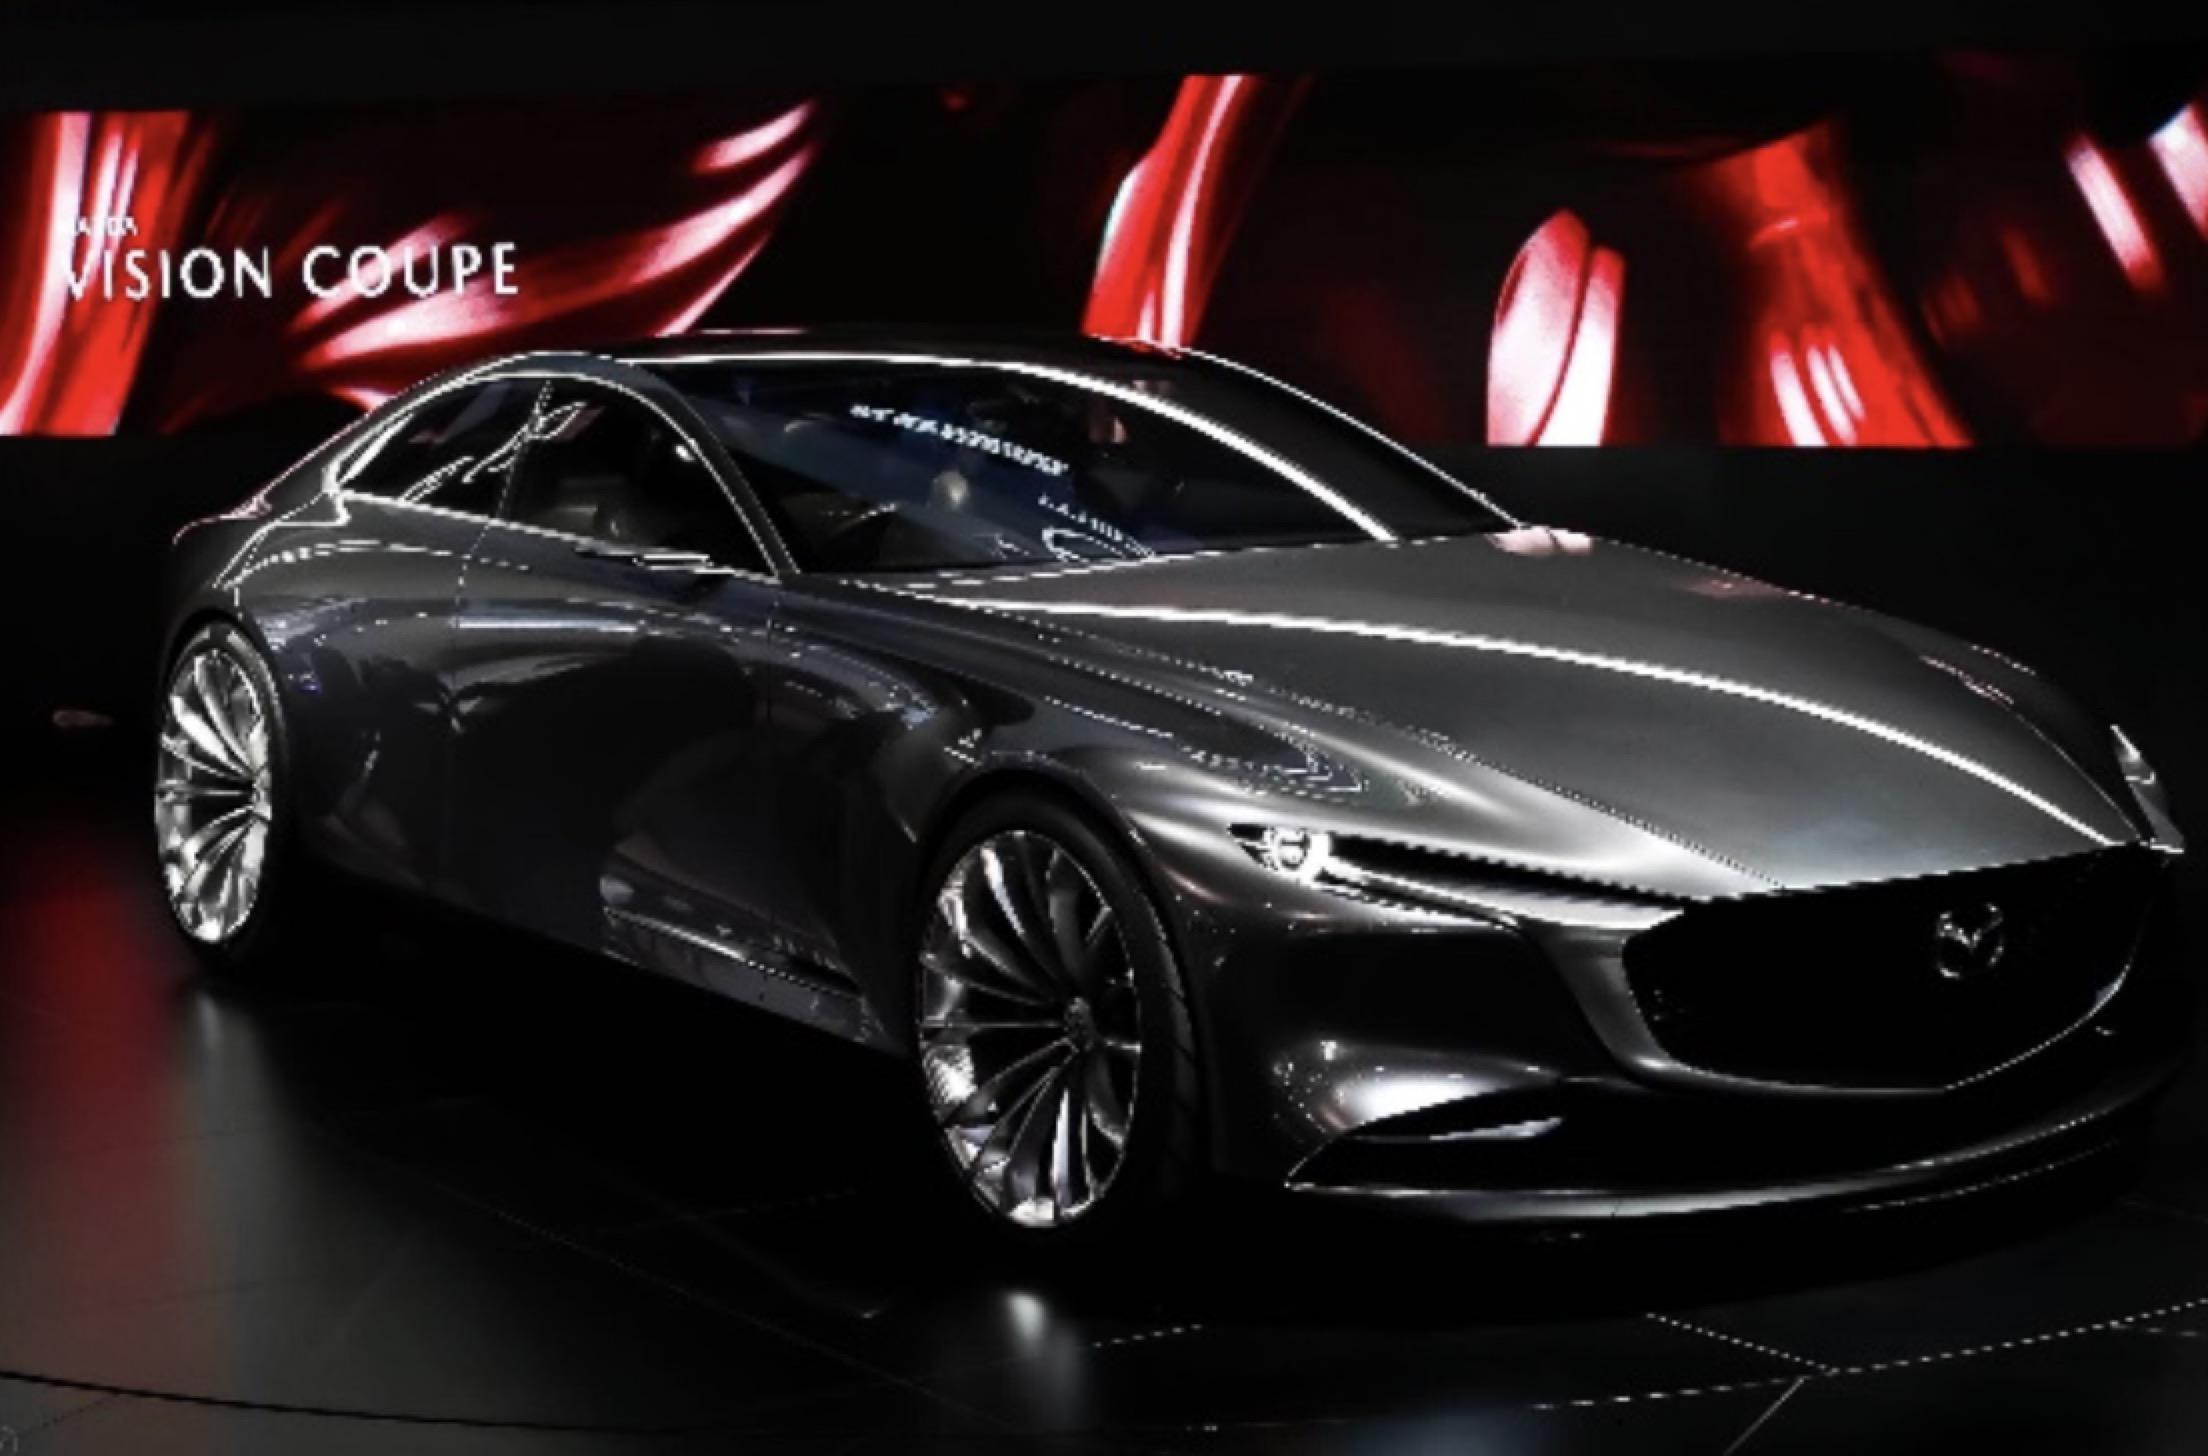 马自达Mazda VISION COUPE概念车